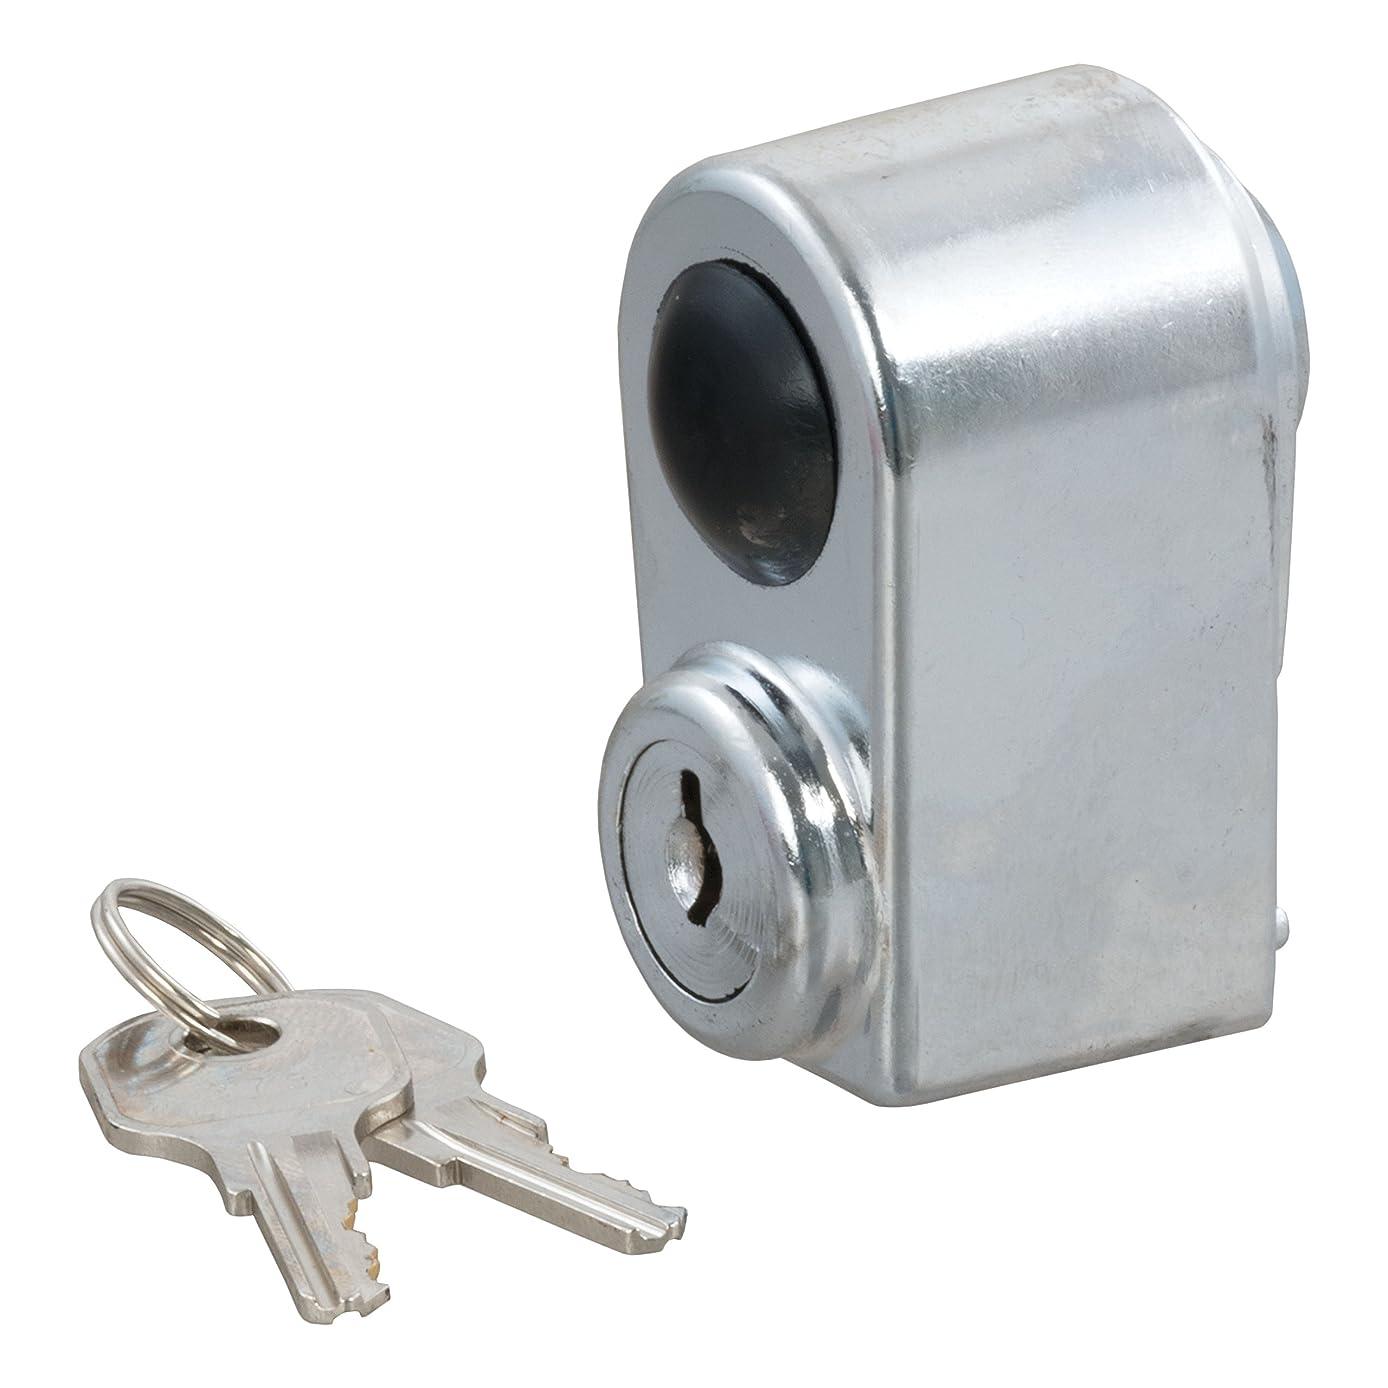 CURT 23562  Spare Tire Lock